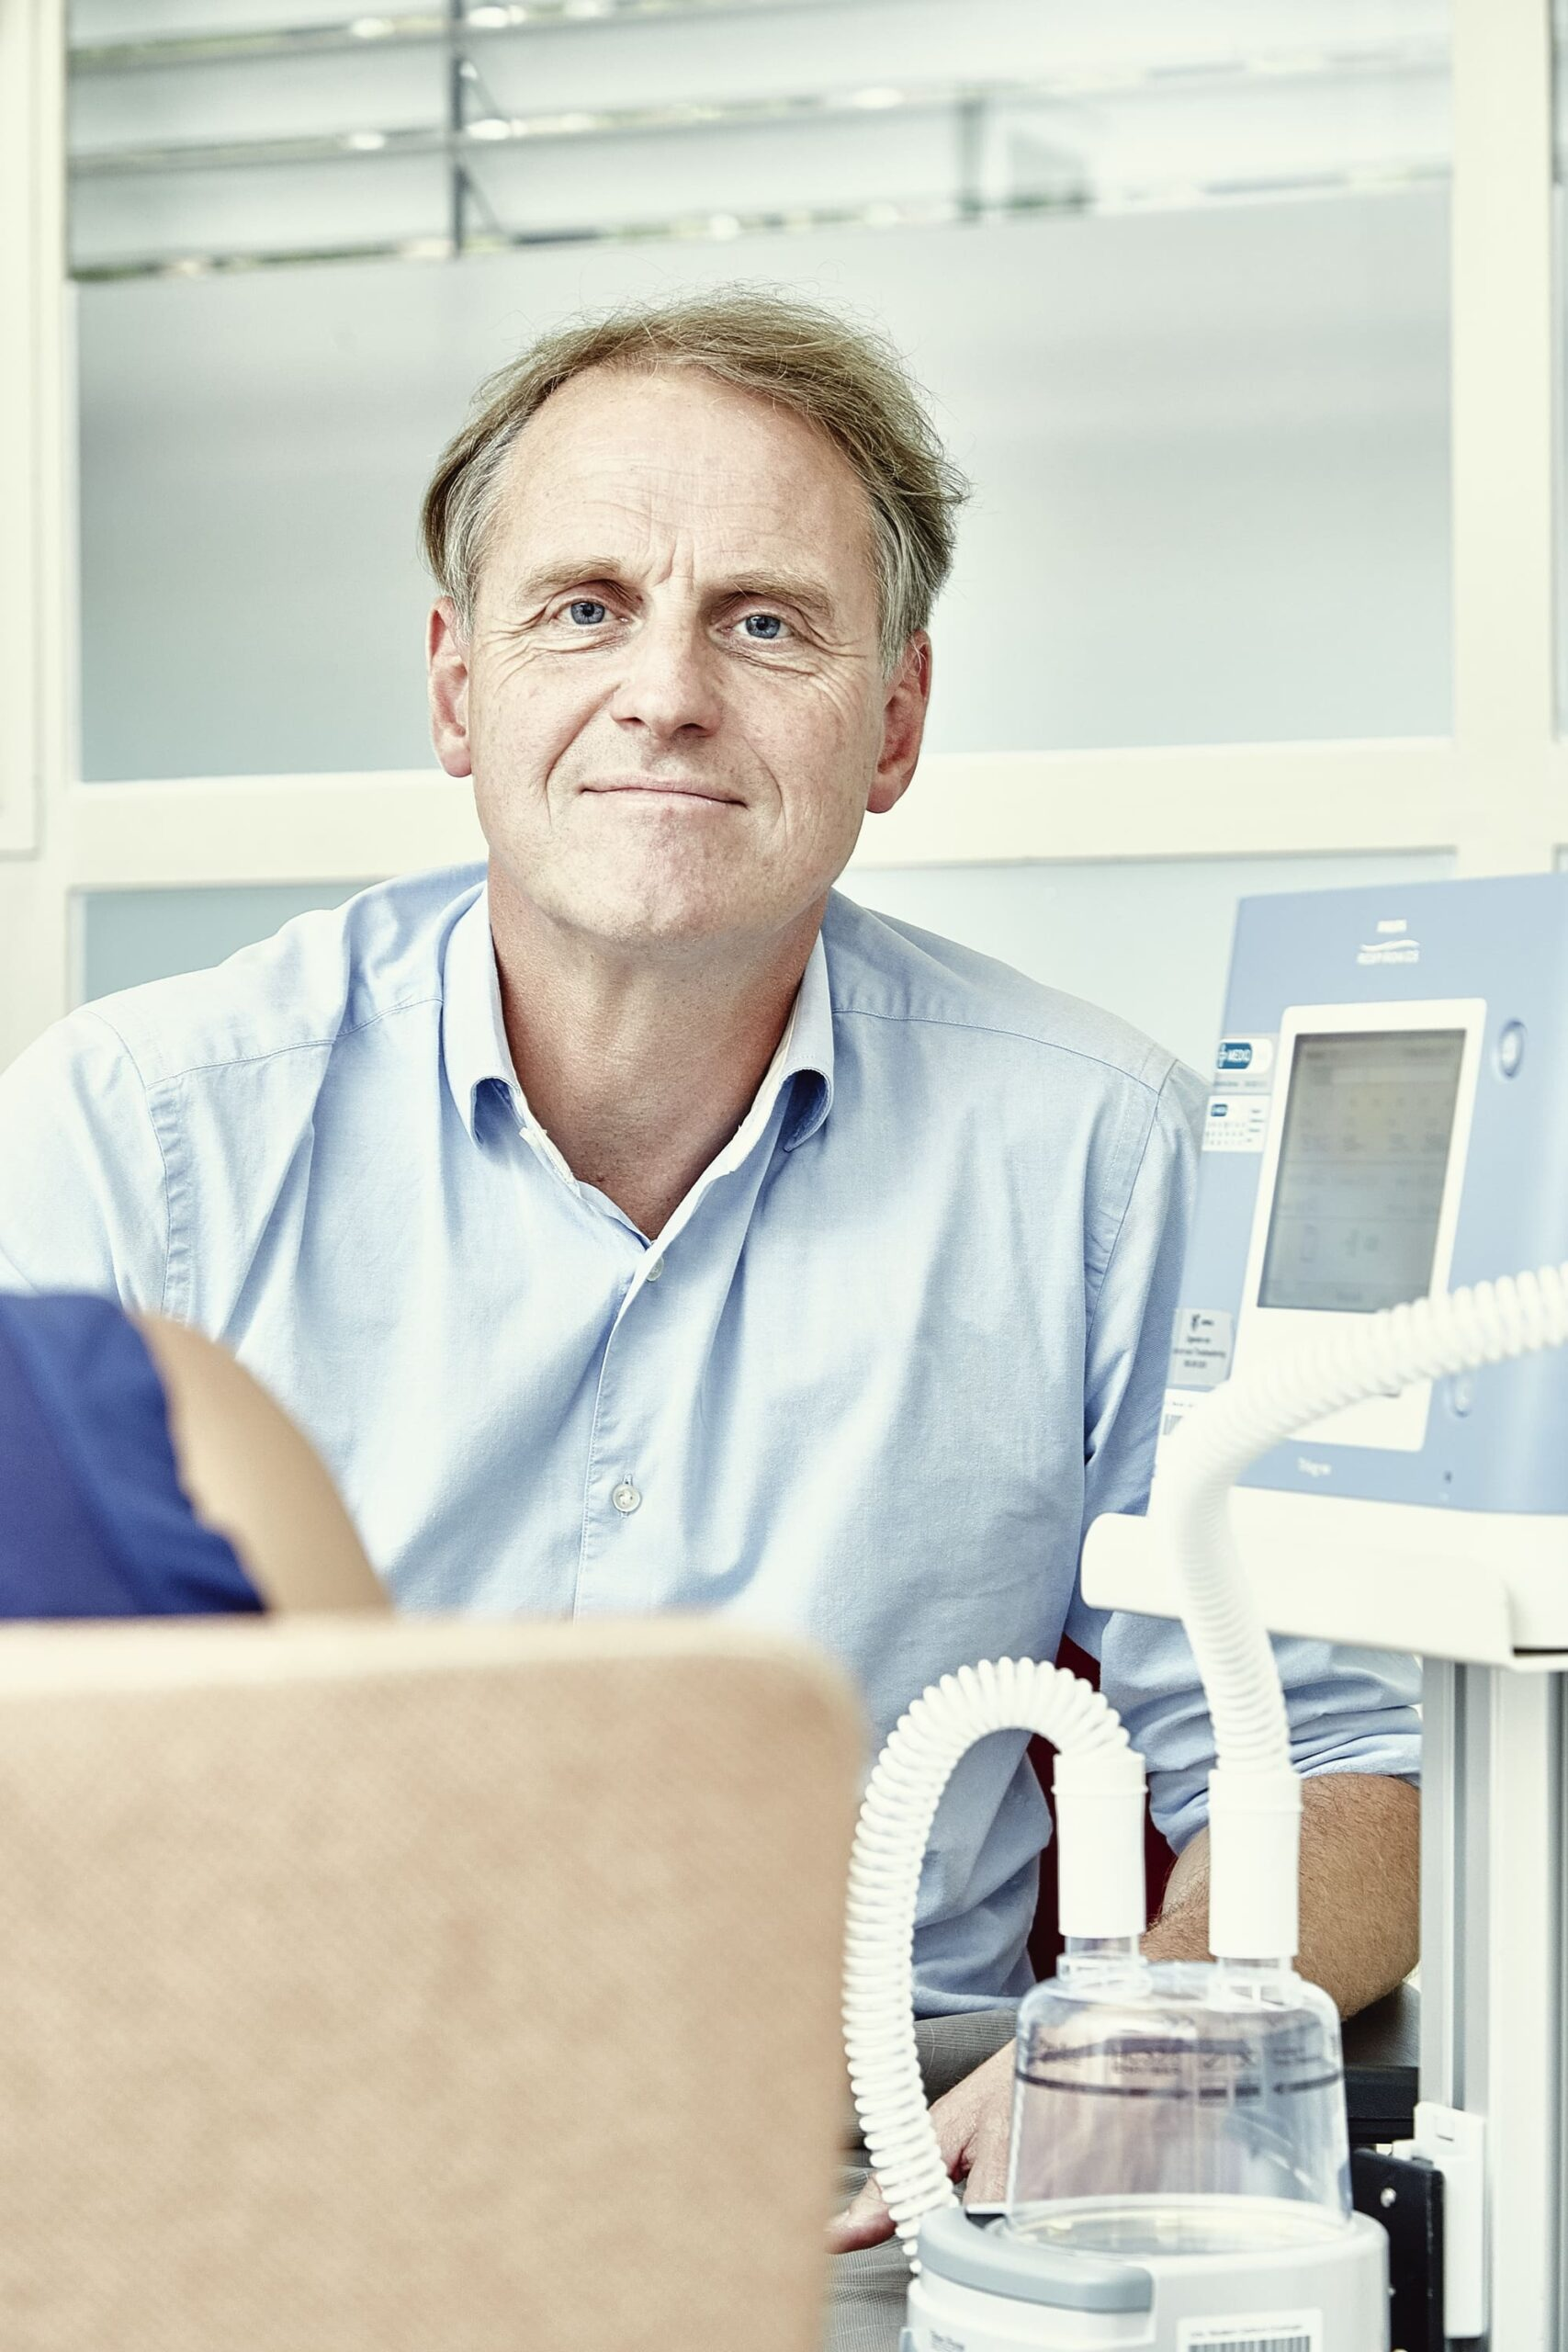 Peter Wijkstra - profile image